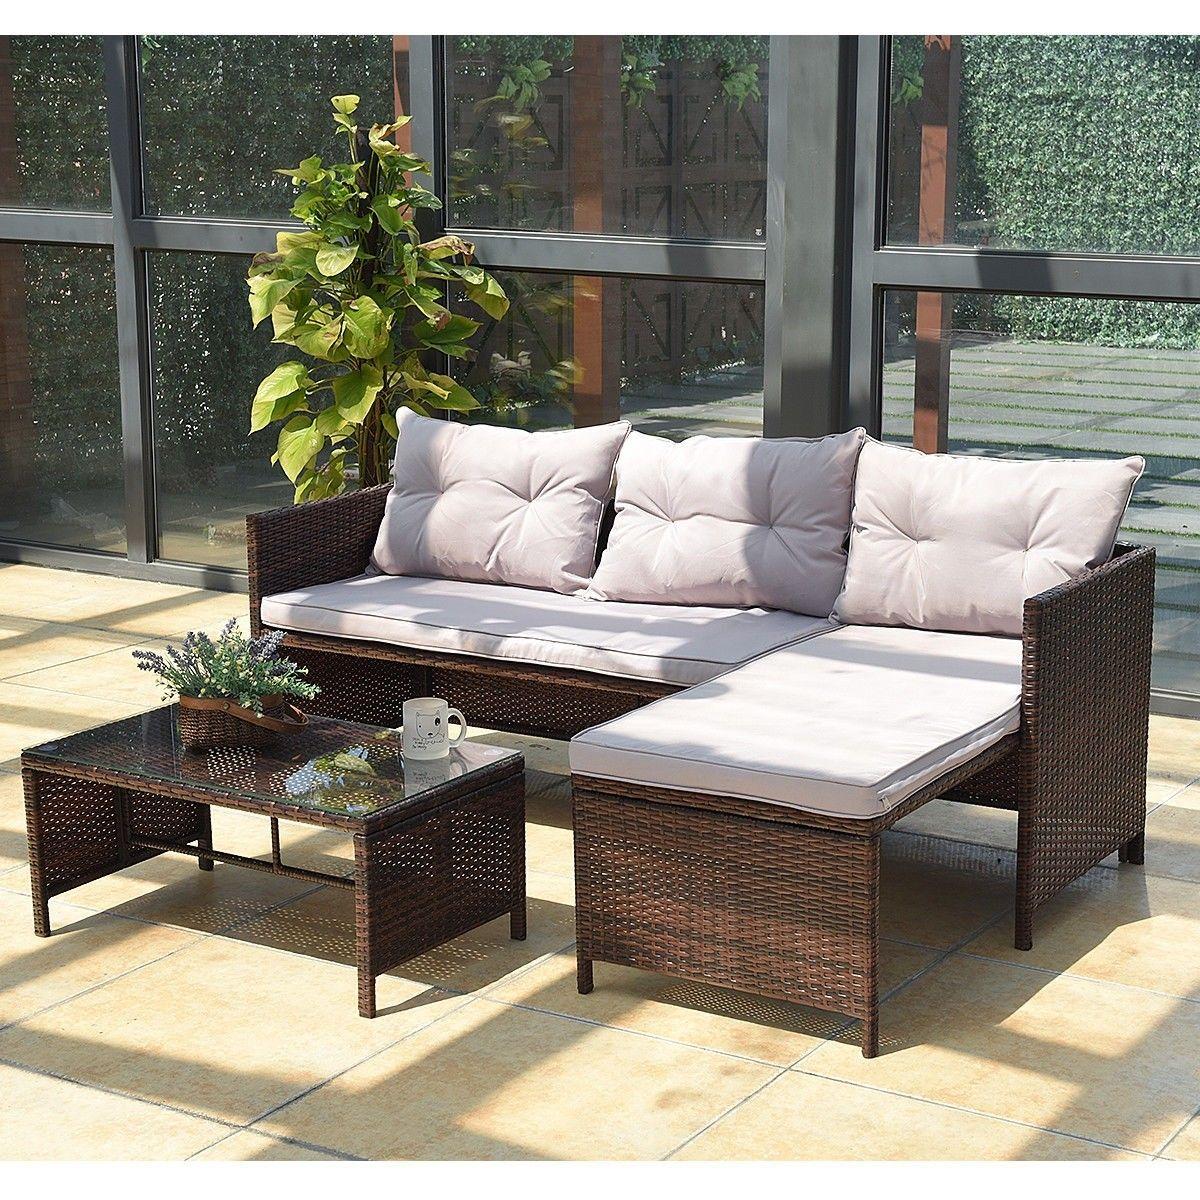 3 Pcs Rattan Wicker Deck Couch Outdoor Patio Sofa Set Furniture